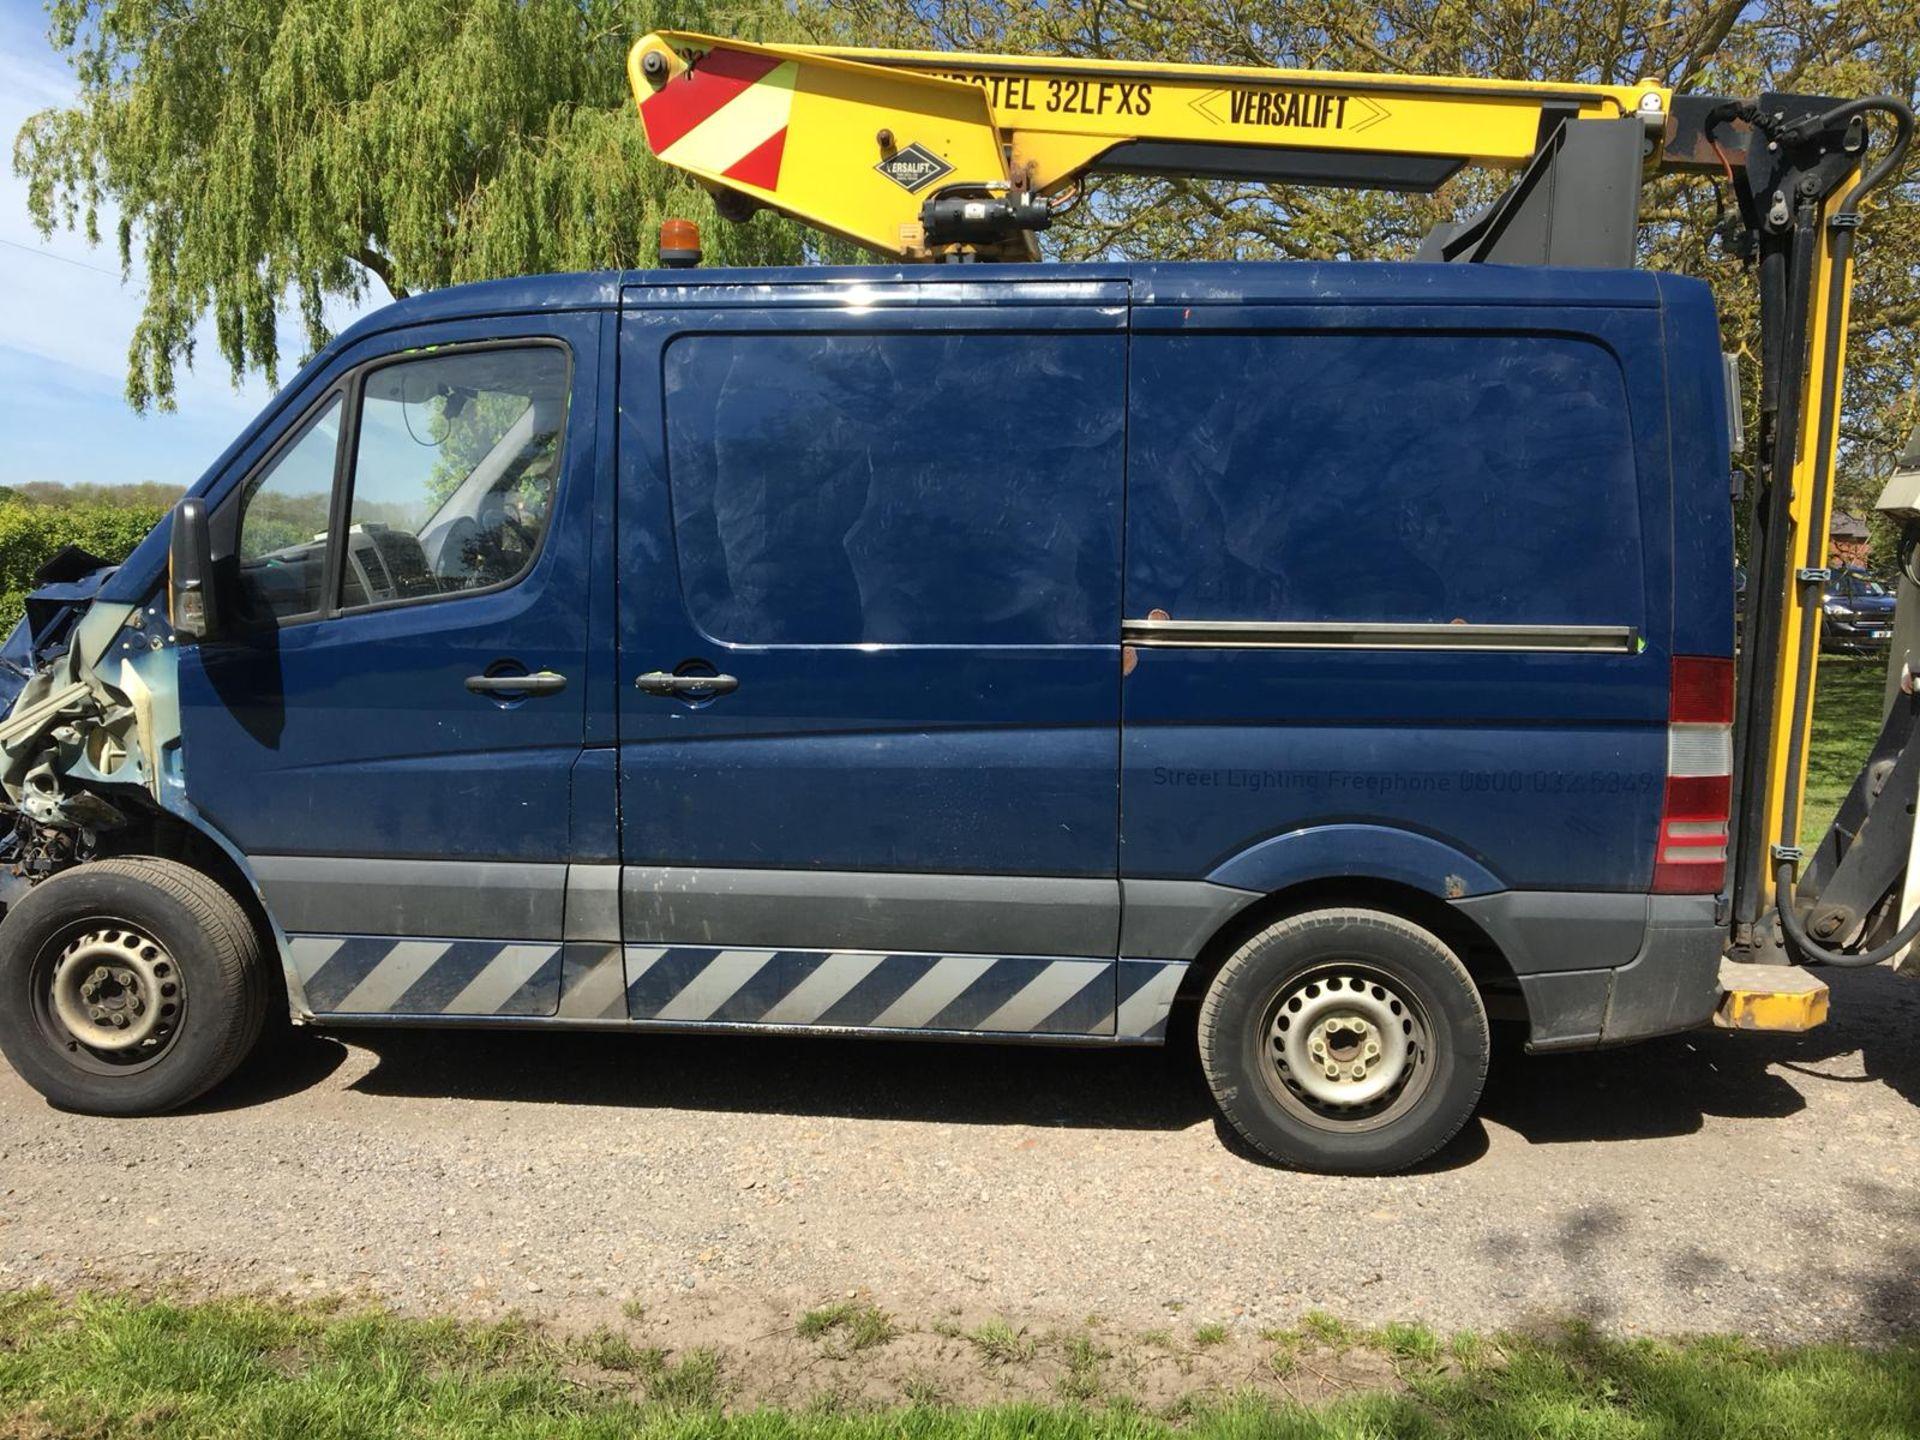 Lot 37B - 2012/62 REG MERCEDES-BENZ SPRINTER 310 CDI 2.2 DIESEL BLUE CHERRY PICKER PANEL VAN *PLUS VAT*